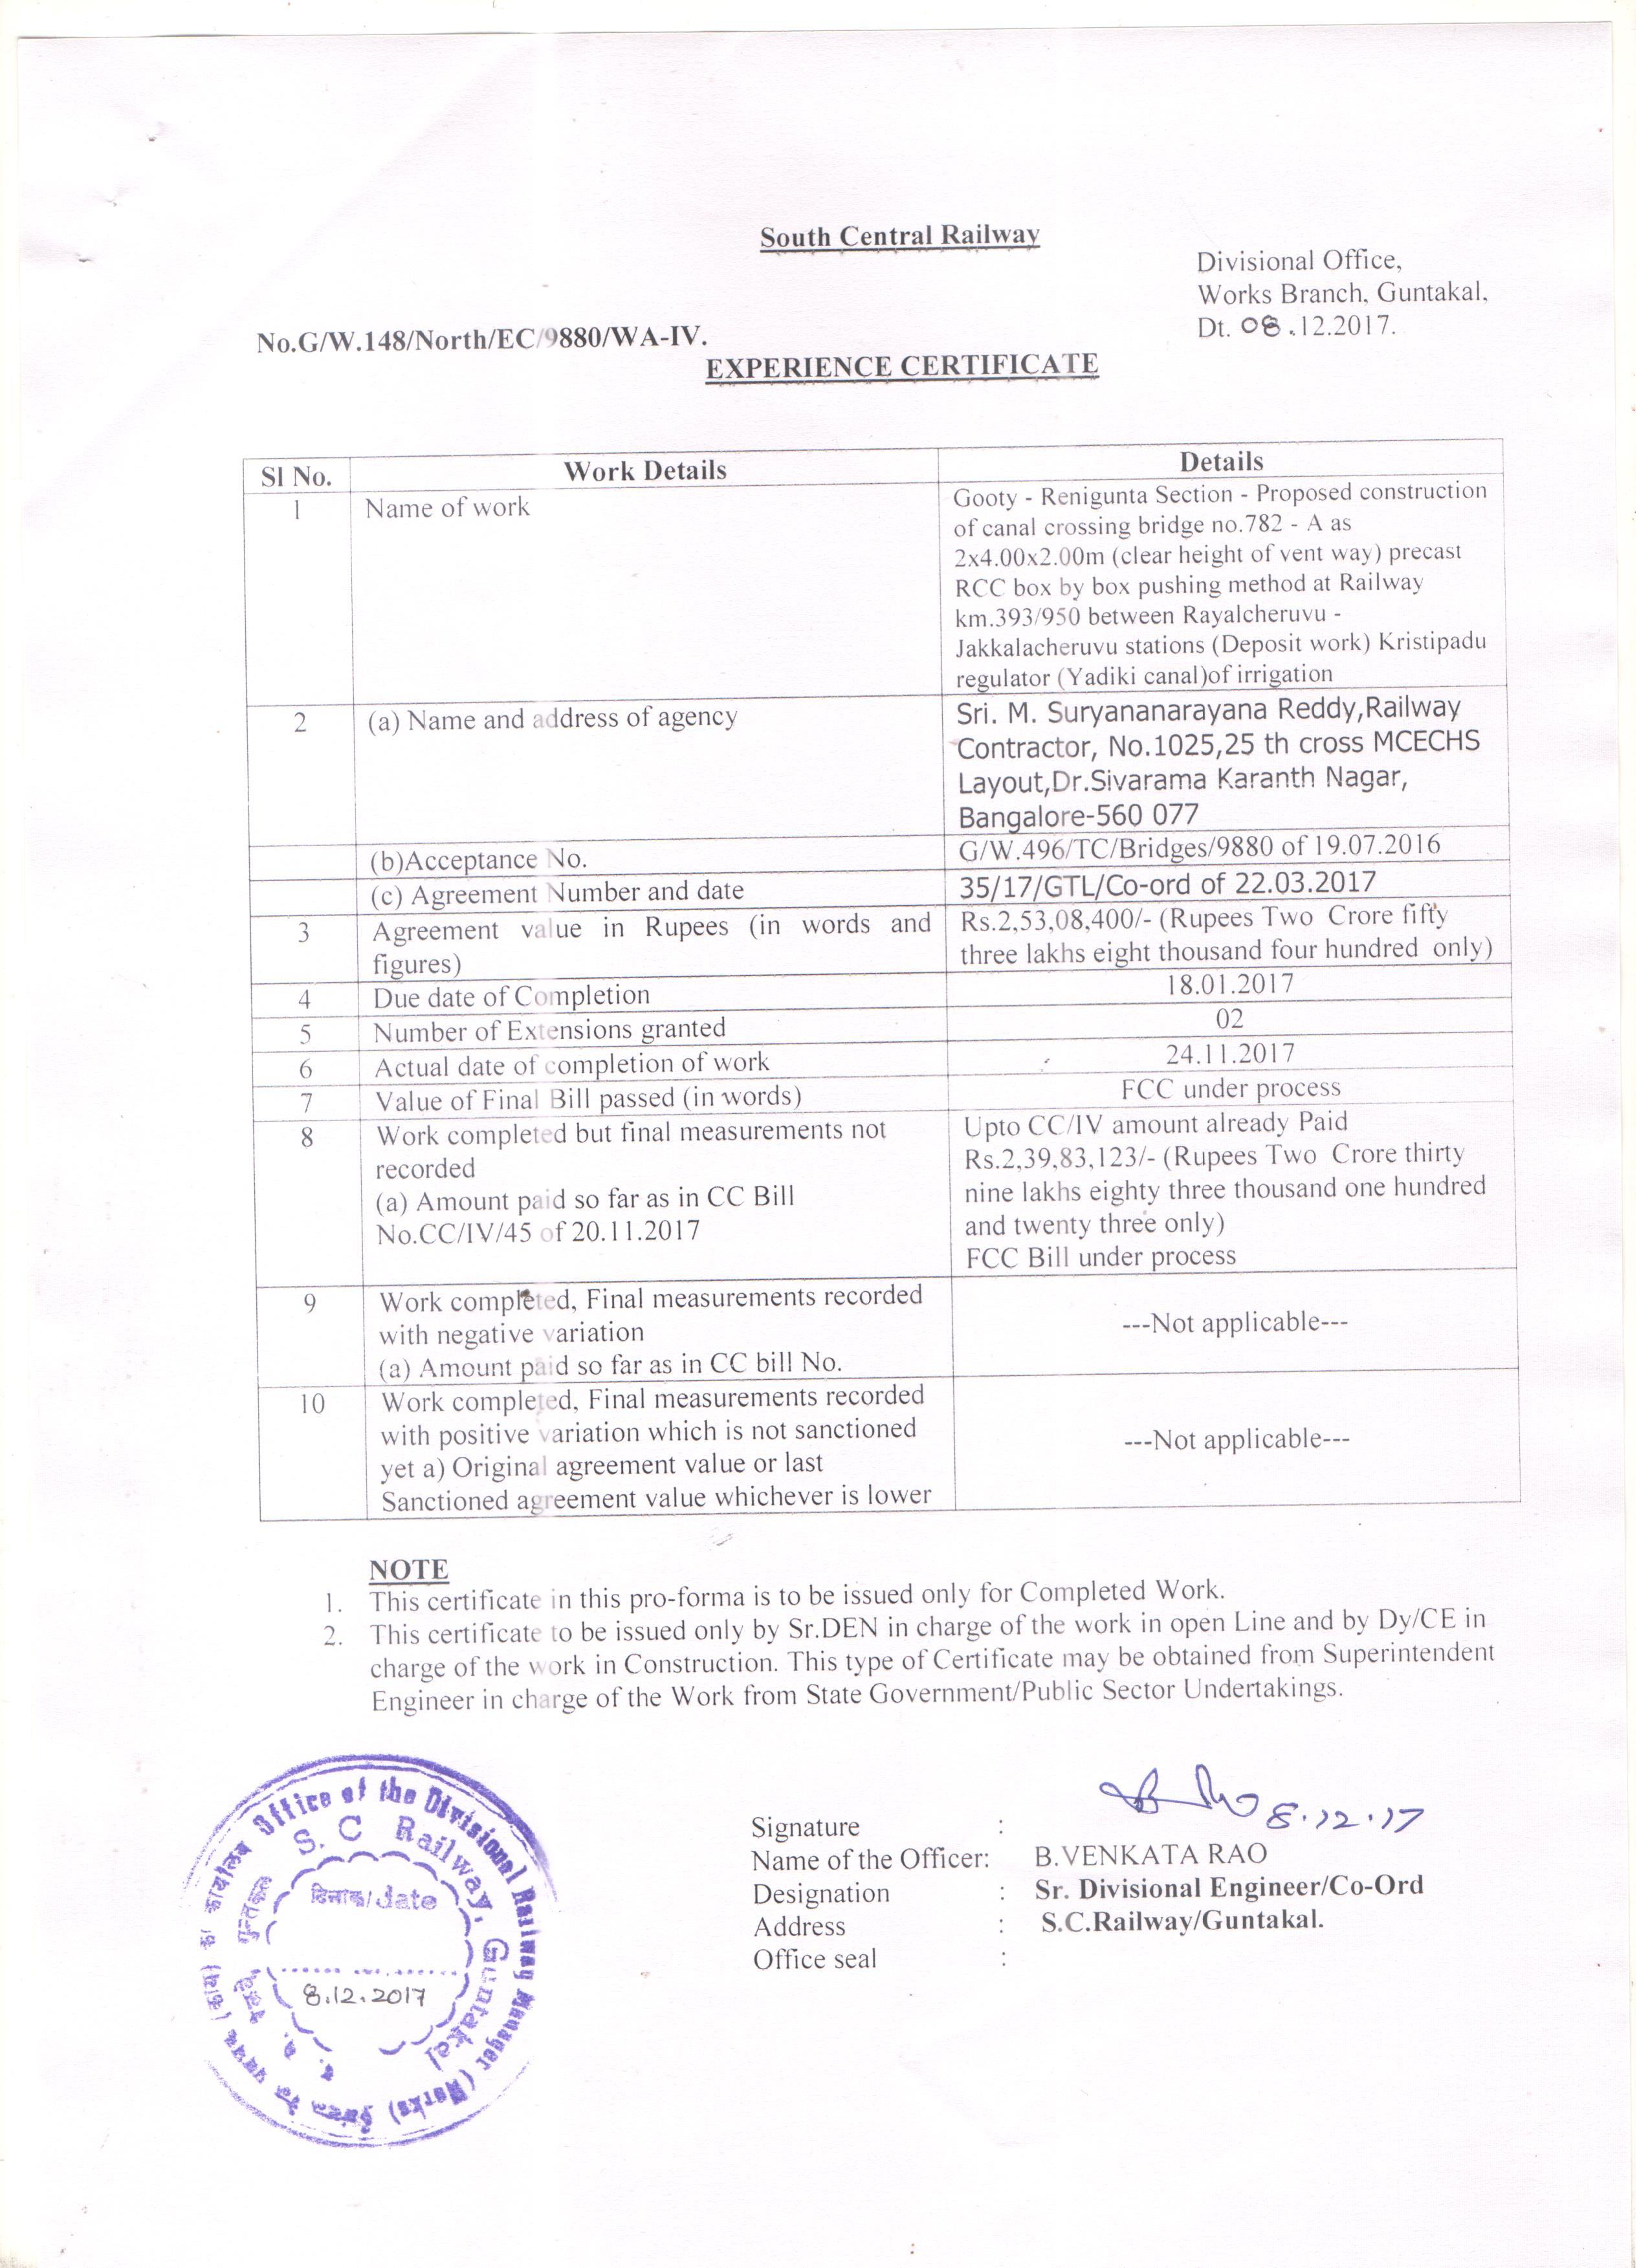 Scrdetails of experience certificate issued no782 a as 2x400x200m clear height of vent way precast rcc box by box pushing method at railway km393950 between rayalcheruvu jakkalacheruvu xflitez Choice Image